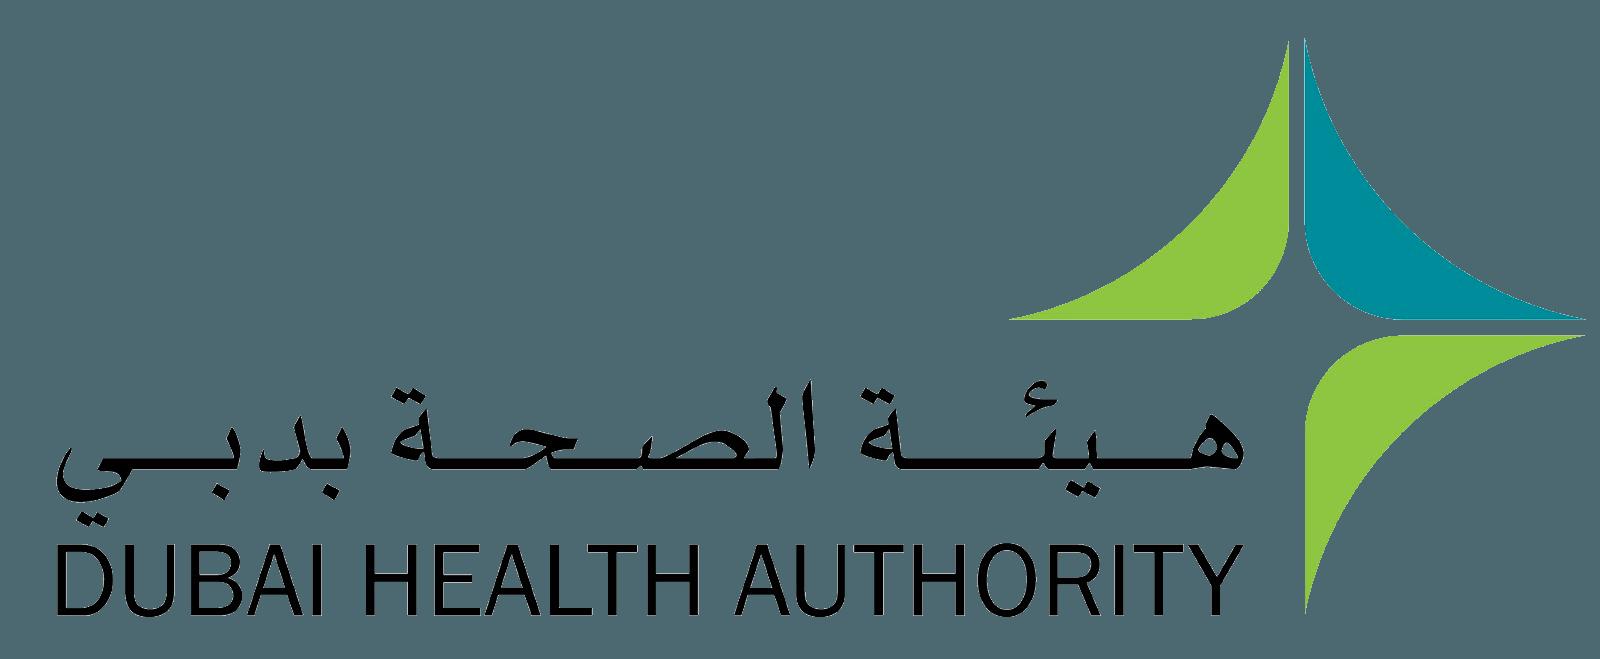 dubai-health-authority-logo